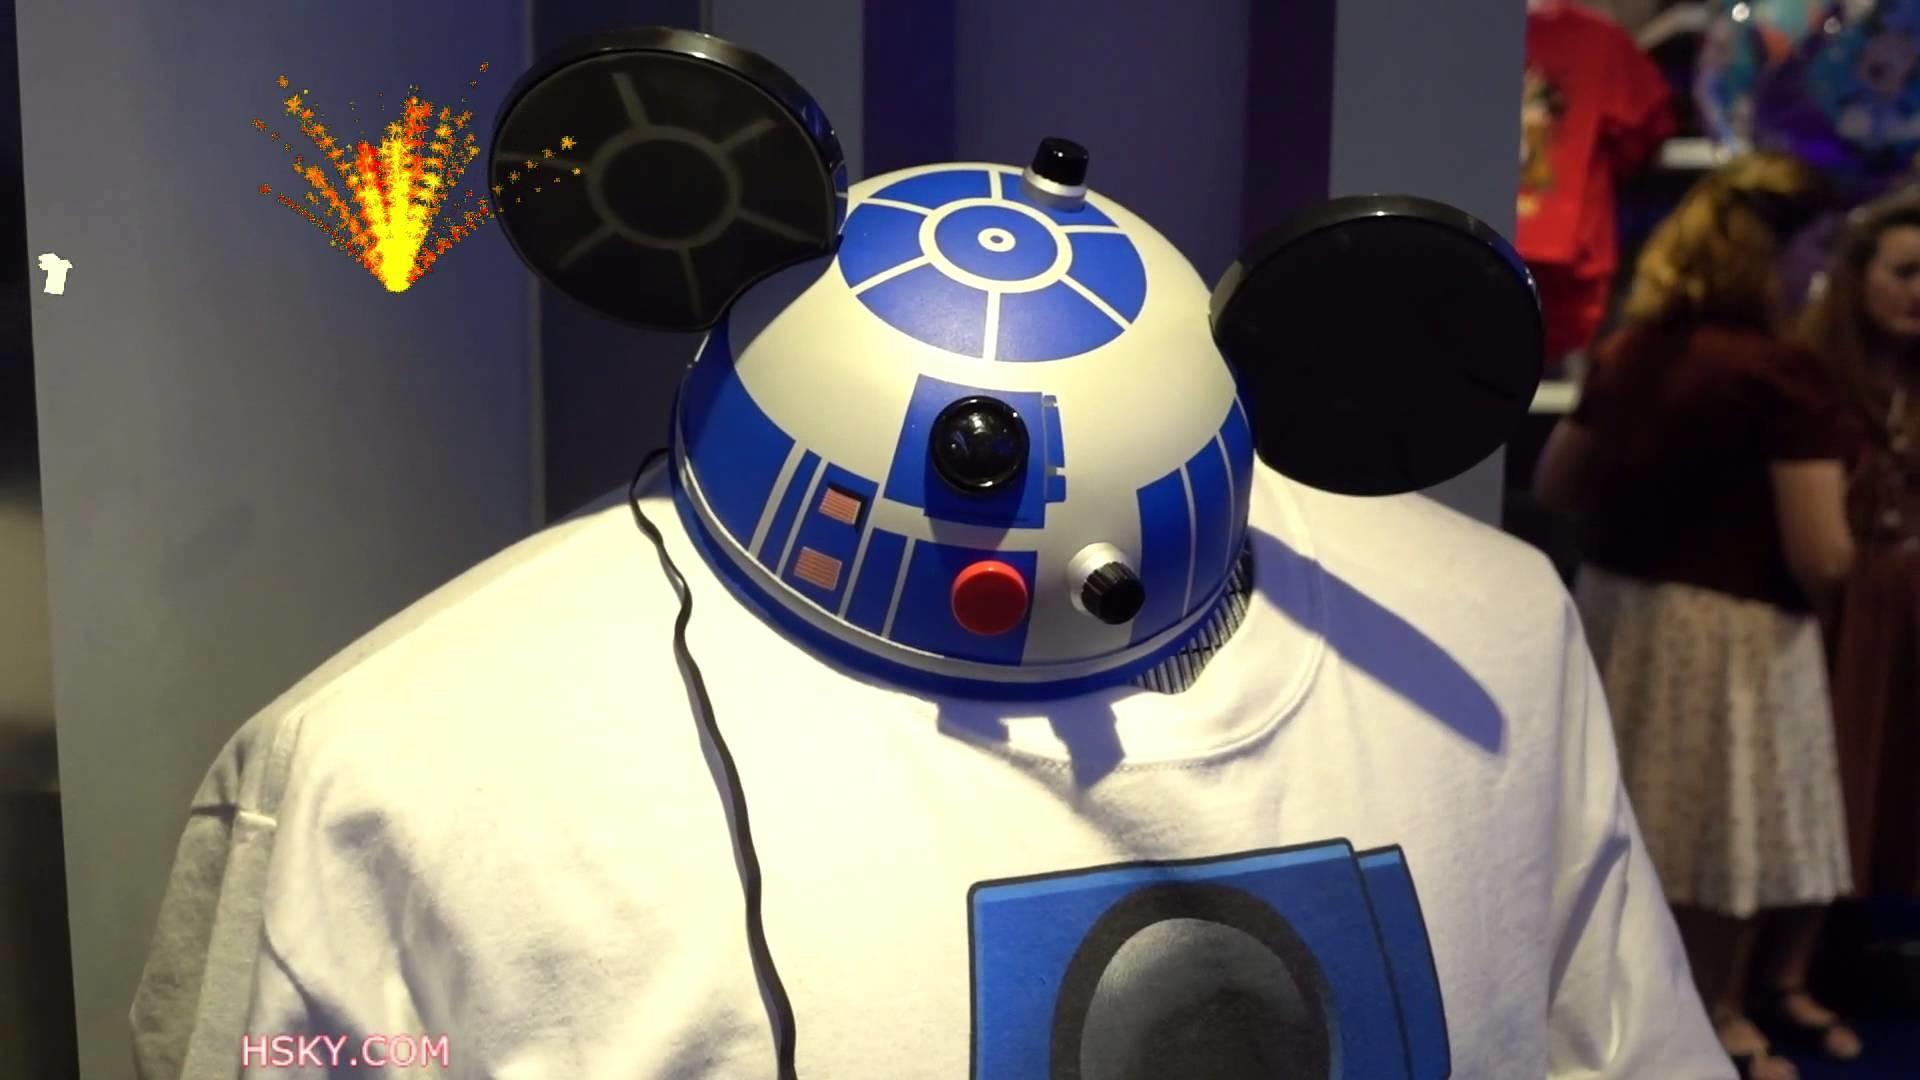 V#436 HSKY Star Wars R2-D2 Mickey Ear HAT @ Disneyland Tomorrow Land 2015 HD